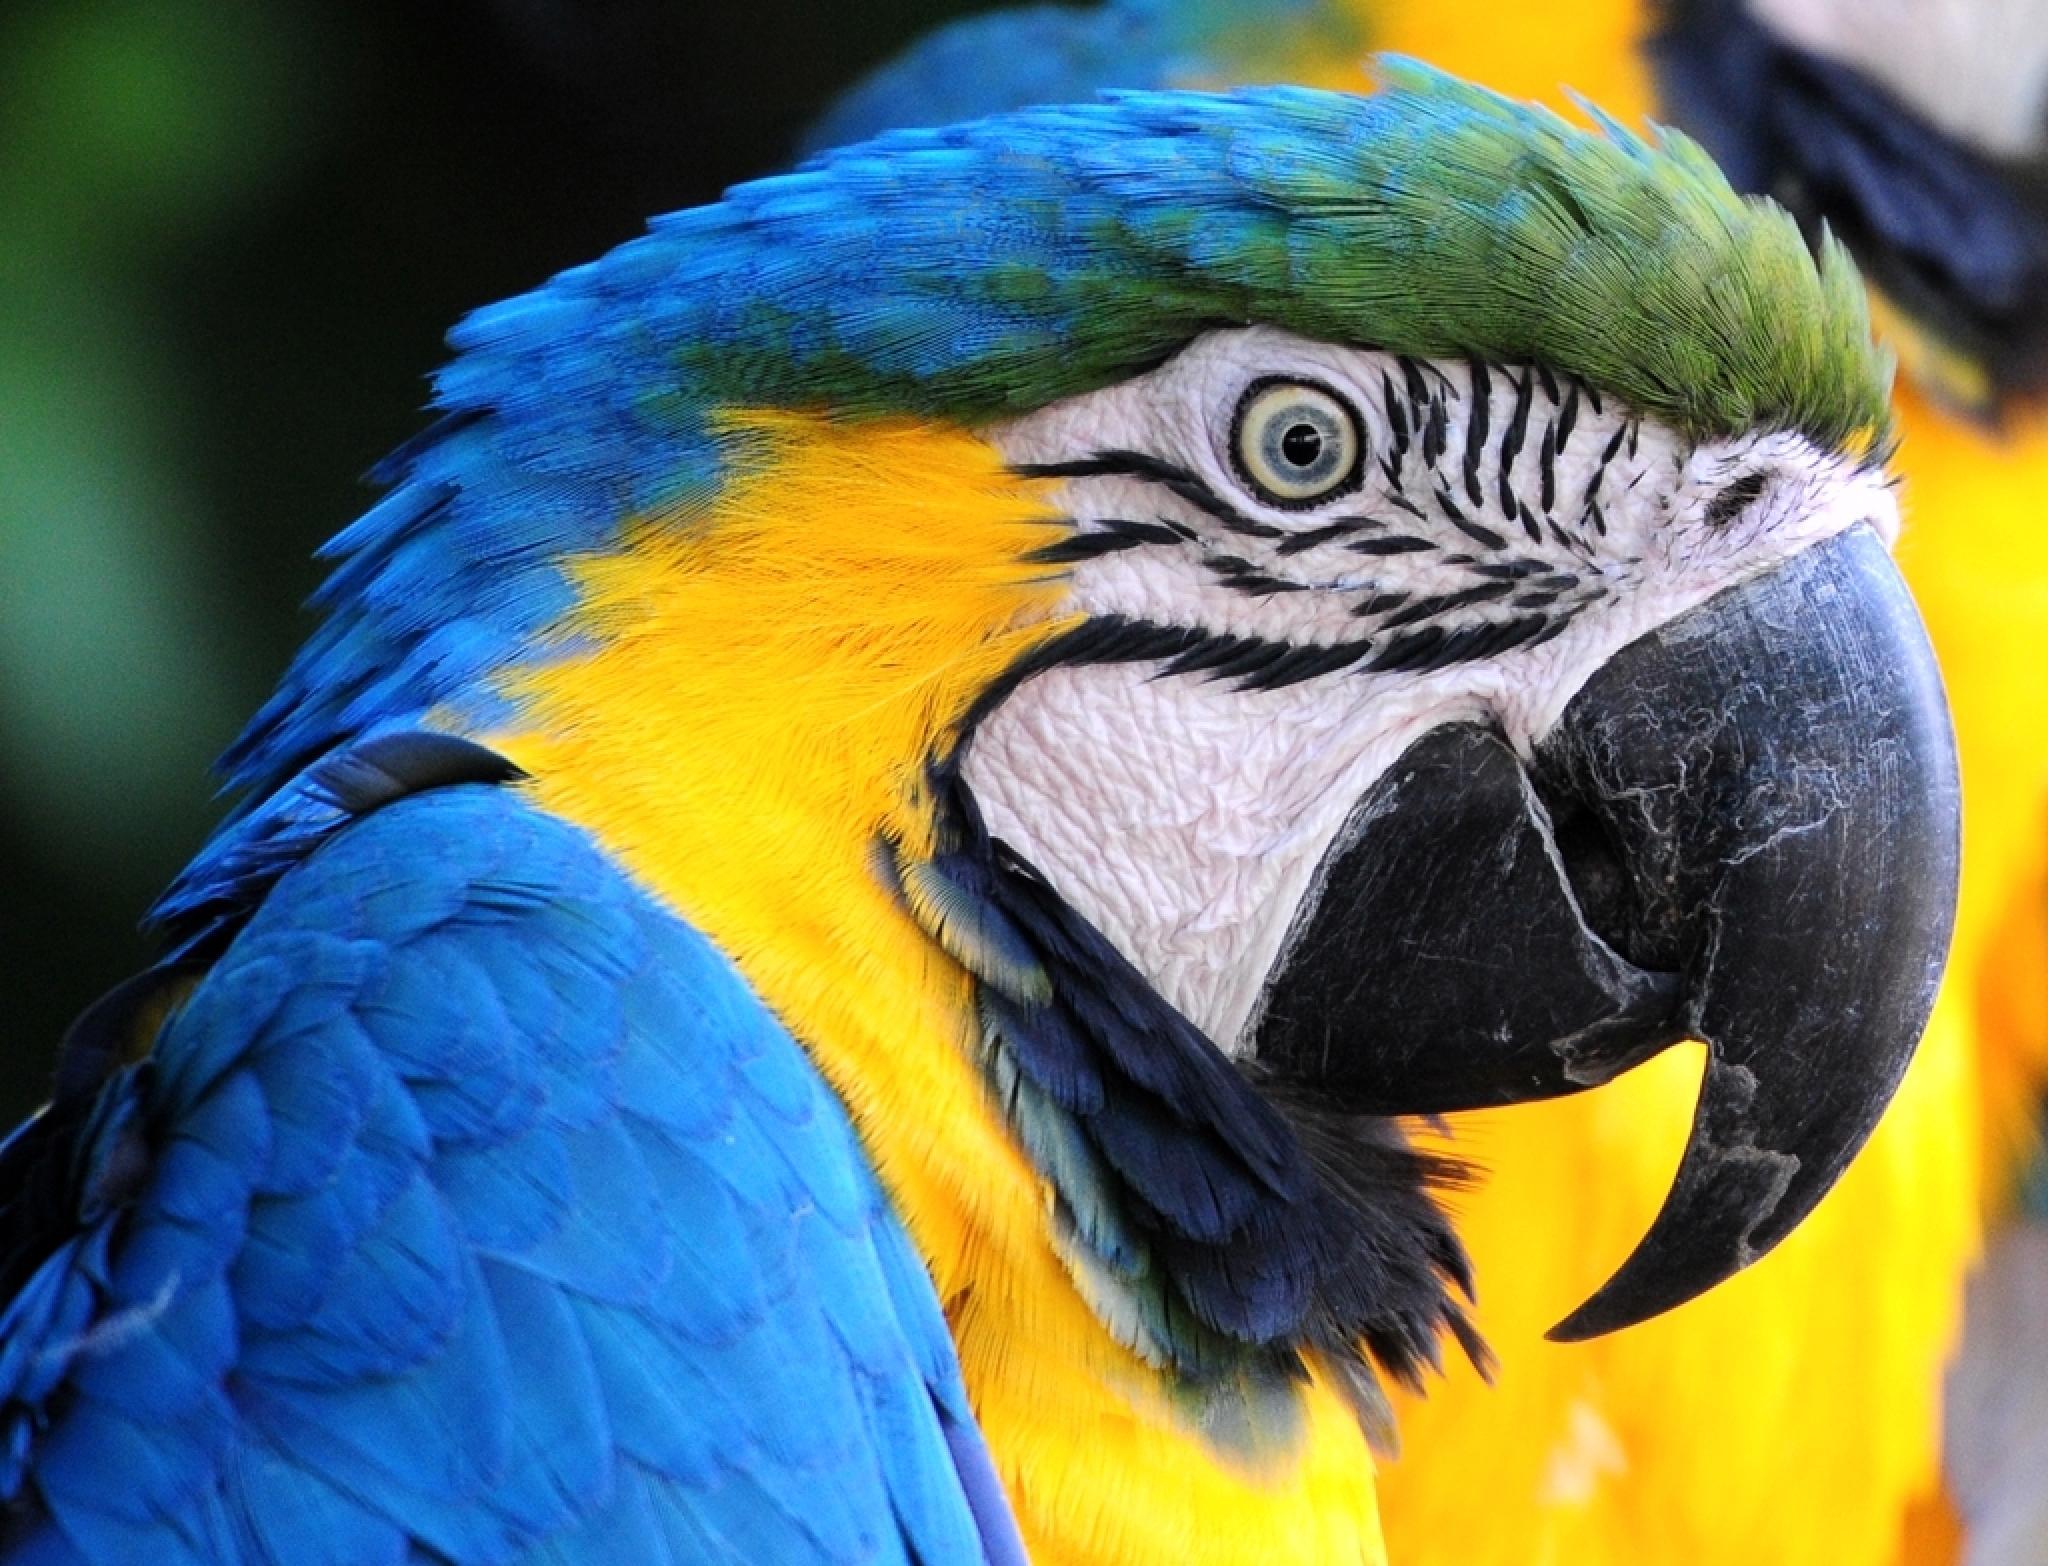 Parrot by henkschneider